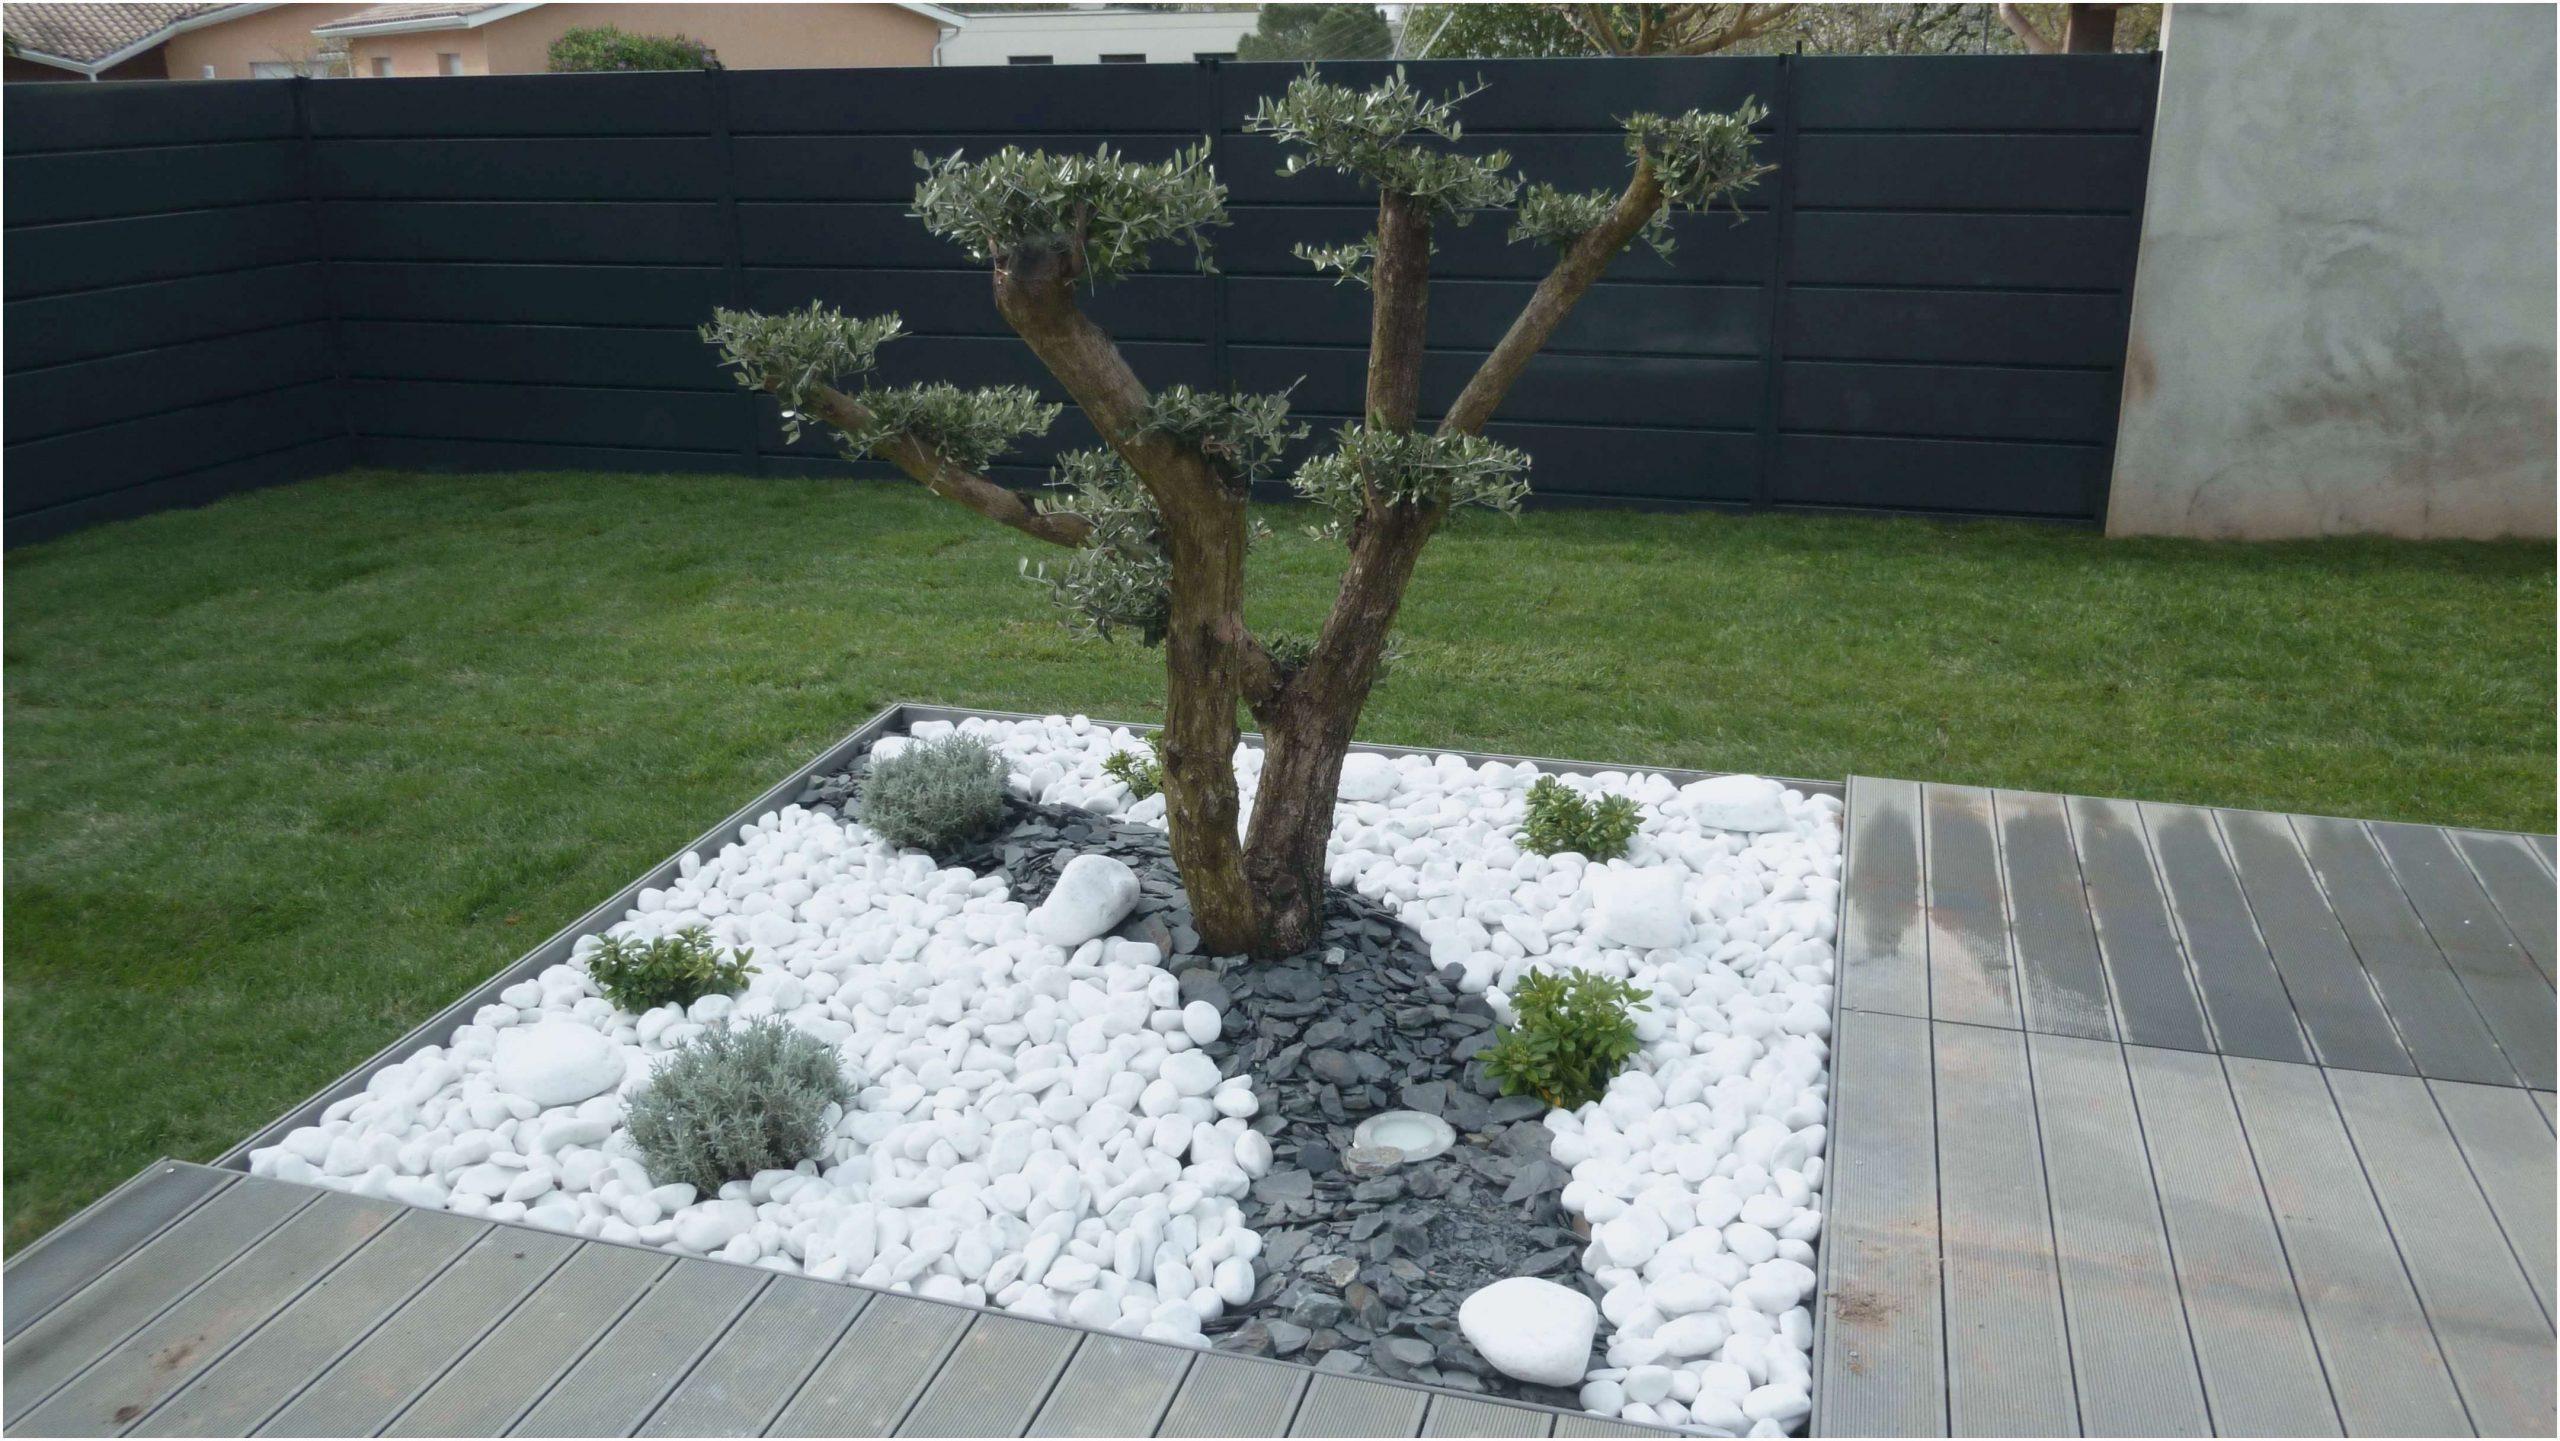 Idee Deco Jardin Avec Gravillon | Idee Deco Jardin ... dedans Amenagement Jardin Avec Pierres